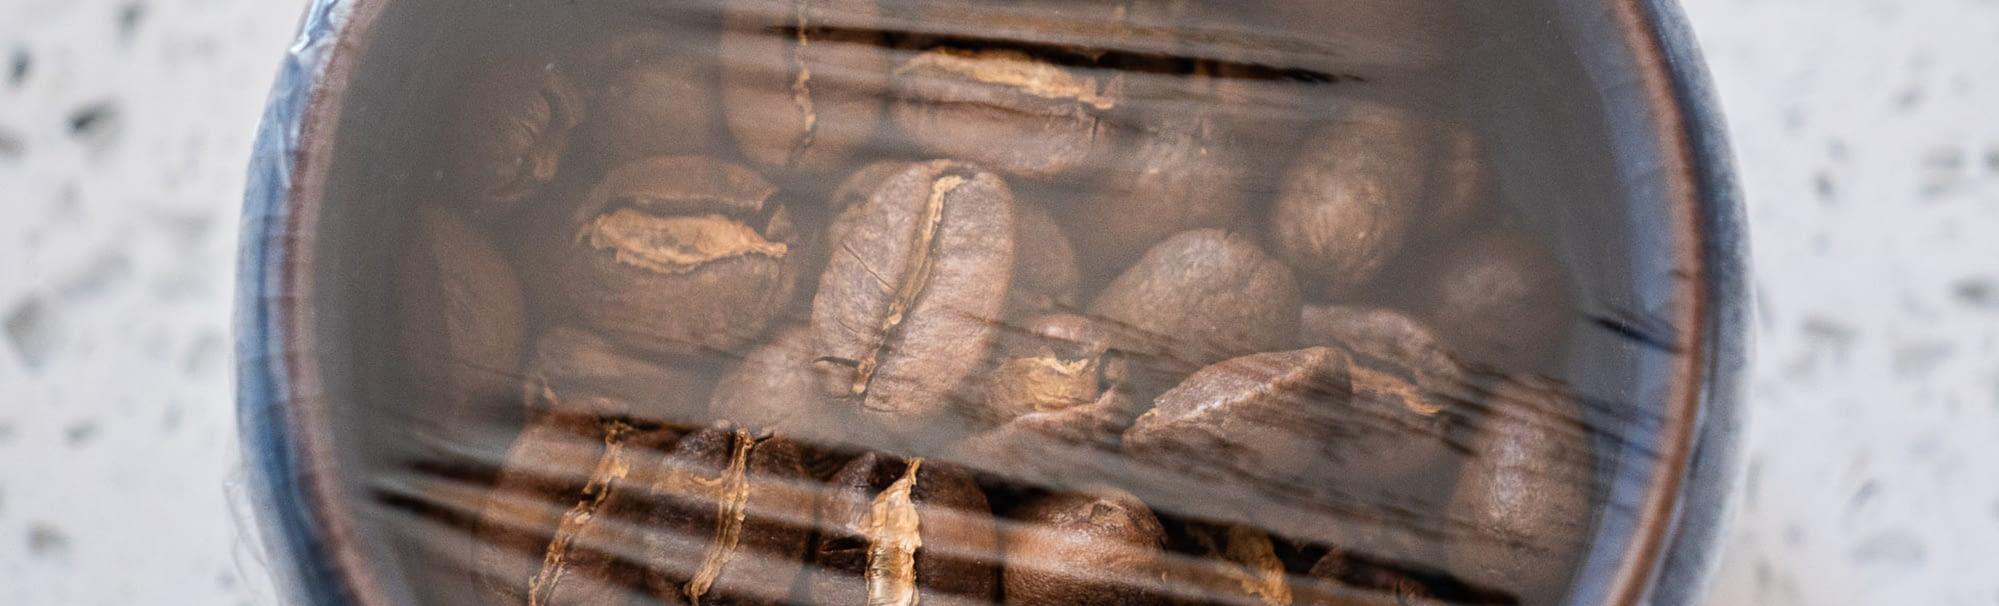 Kaffeebohnen luftdicht verpackt